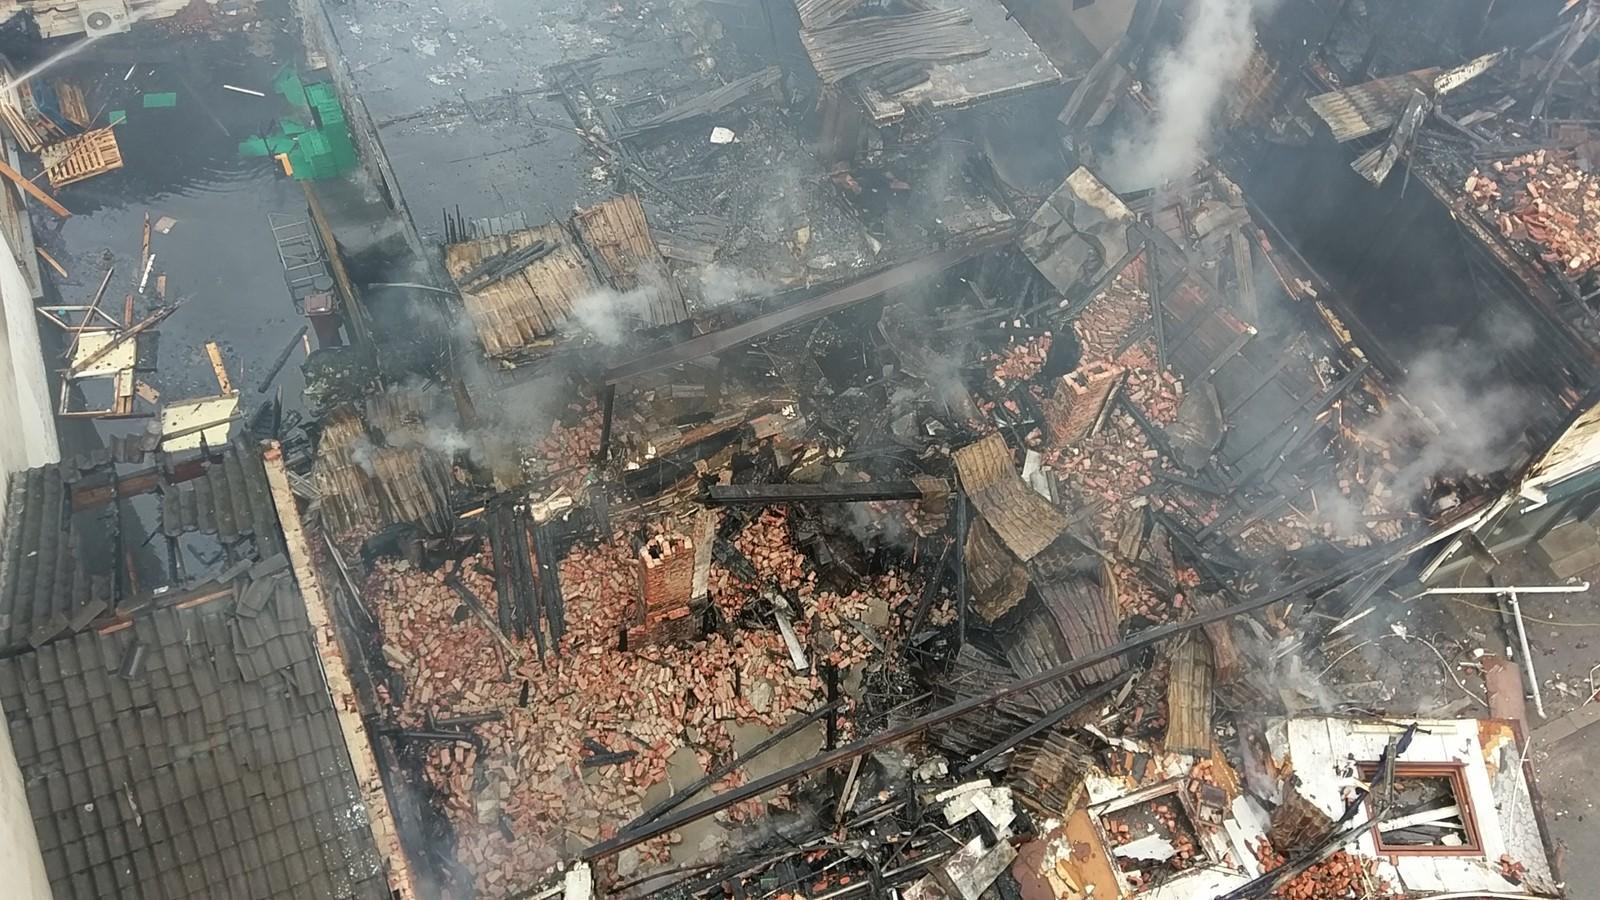 Henrik Wergelands gate 5 er helt nedbrent. Henrik Wergelands  gate 7 og 9 har fått store brannskader.